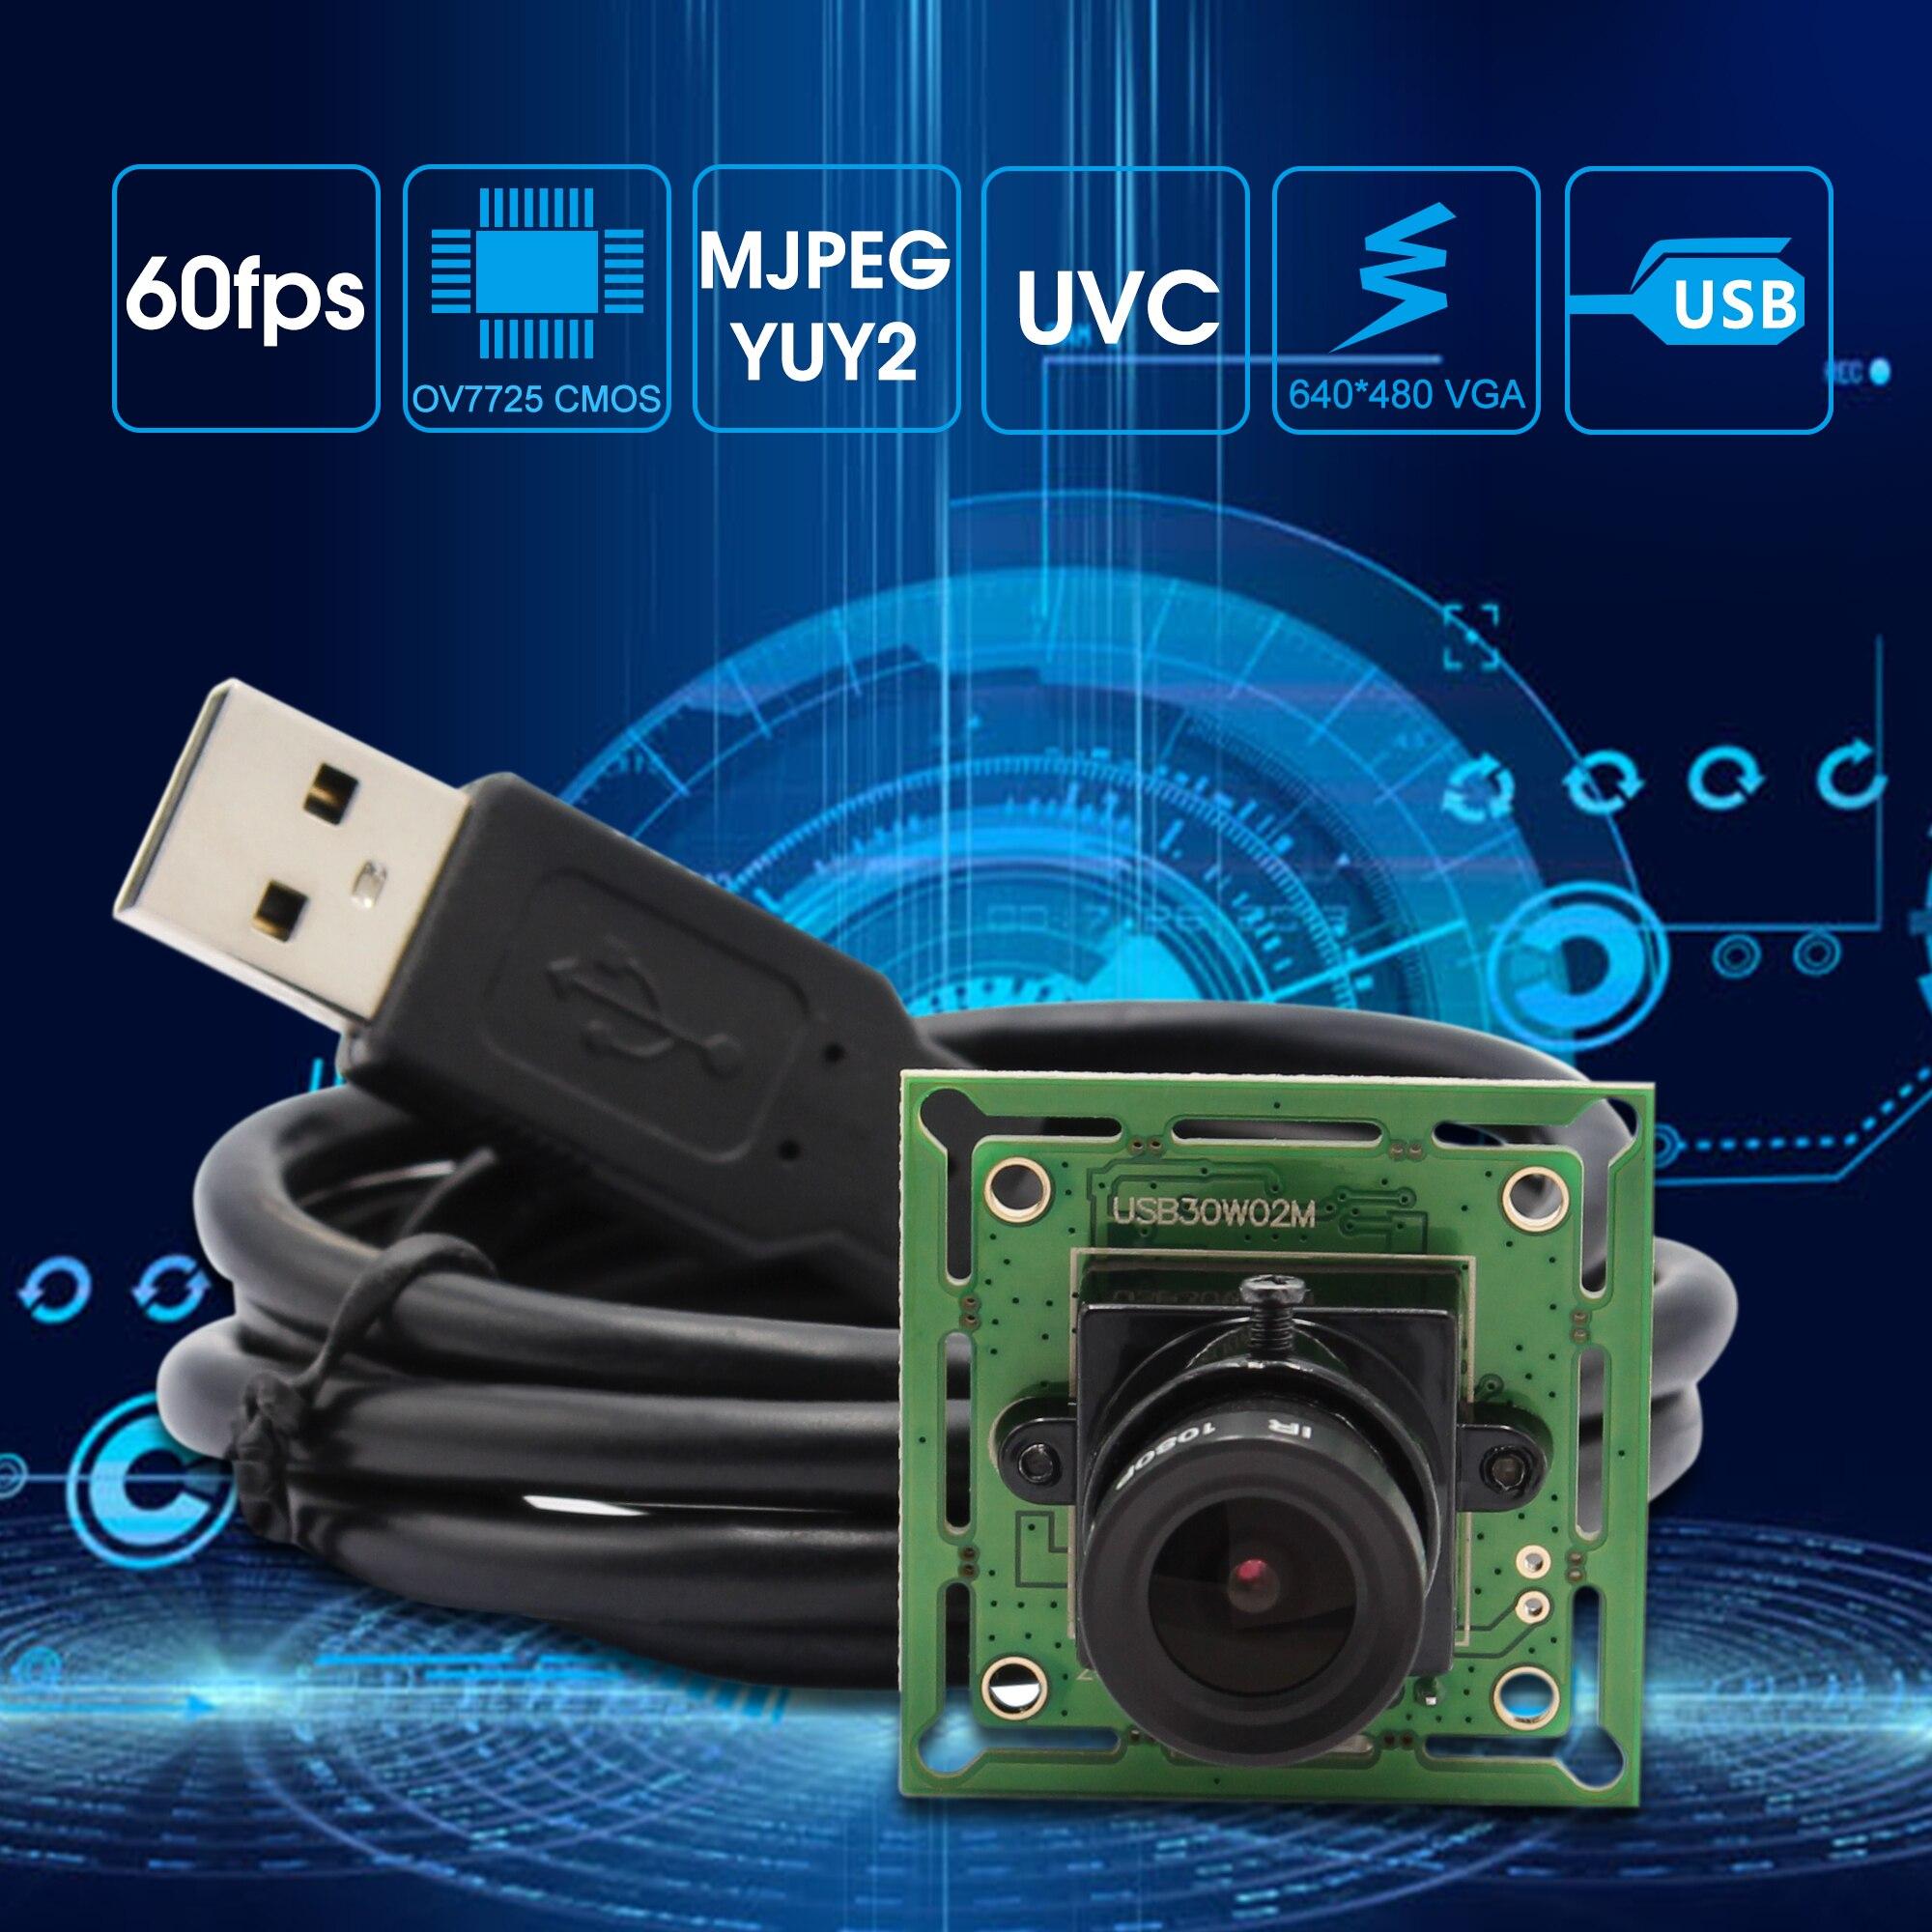 640* 480P Camera Module 1/4 inch CMOS OV7725 USB 2.0 MJPEG 60fps mini board camera usb smallest usb webcam Module